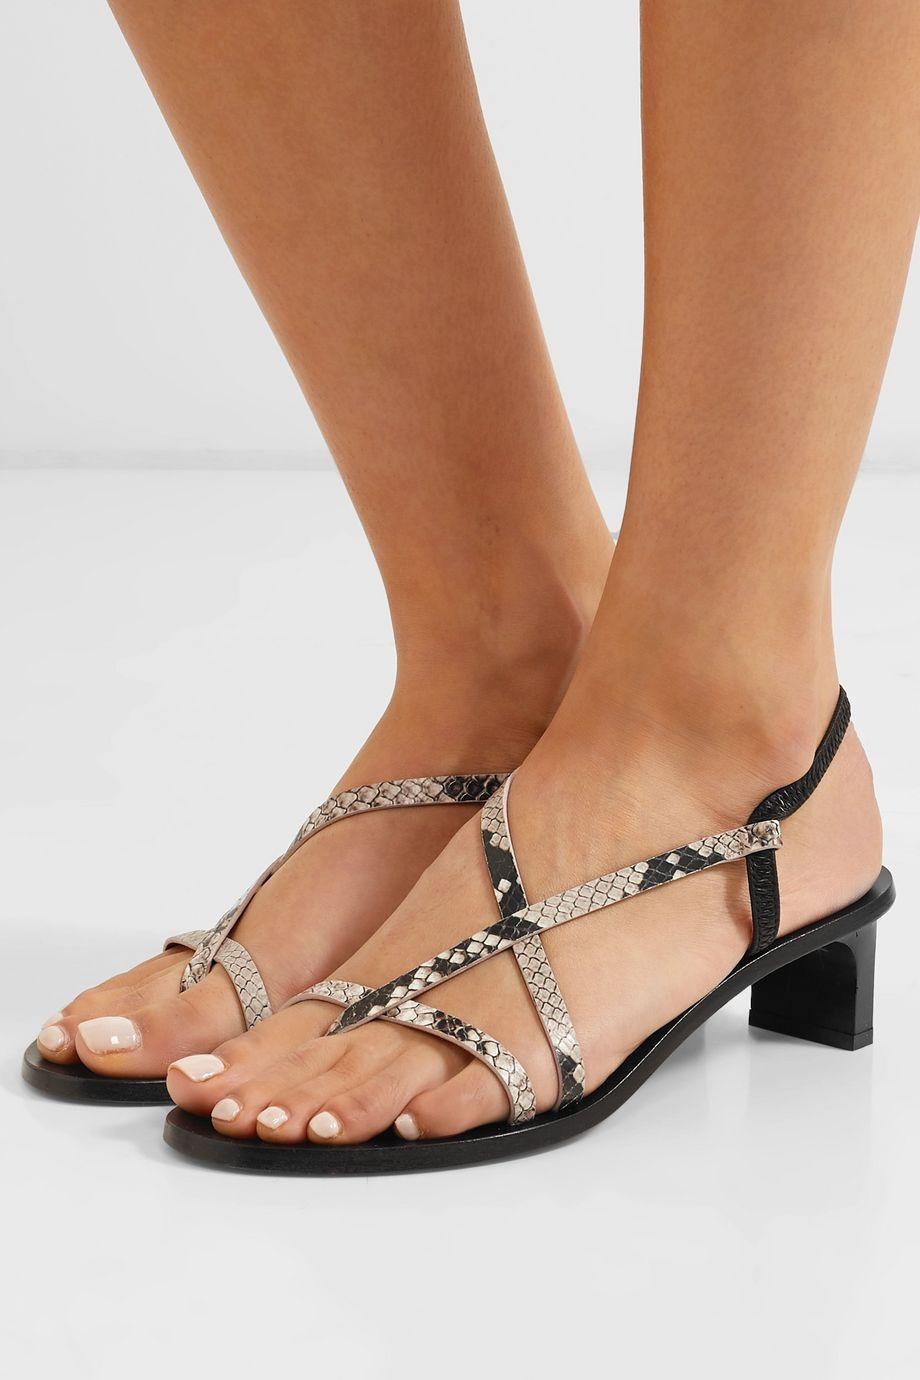 ATP Atelier Nashi snake-effect leather slingback sandals